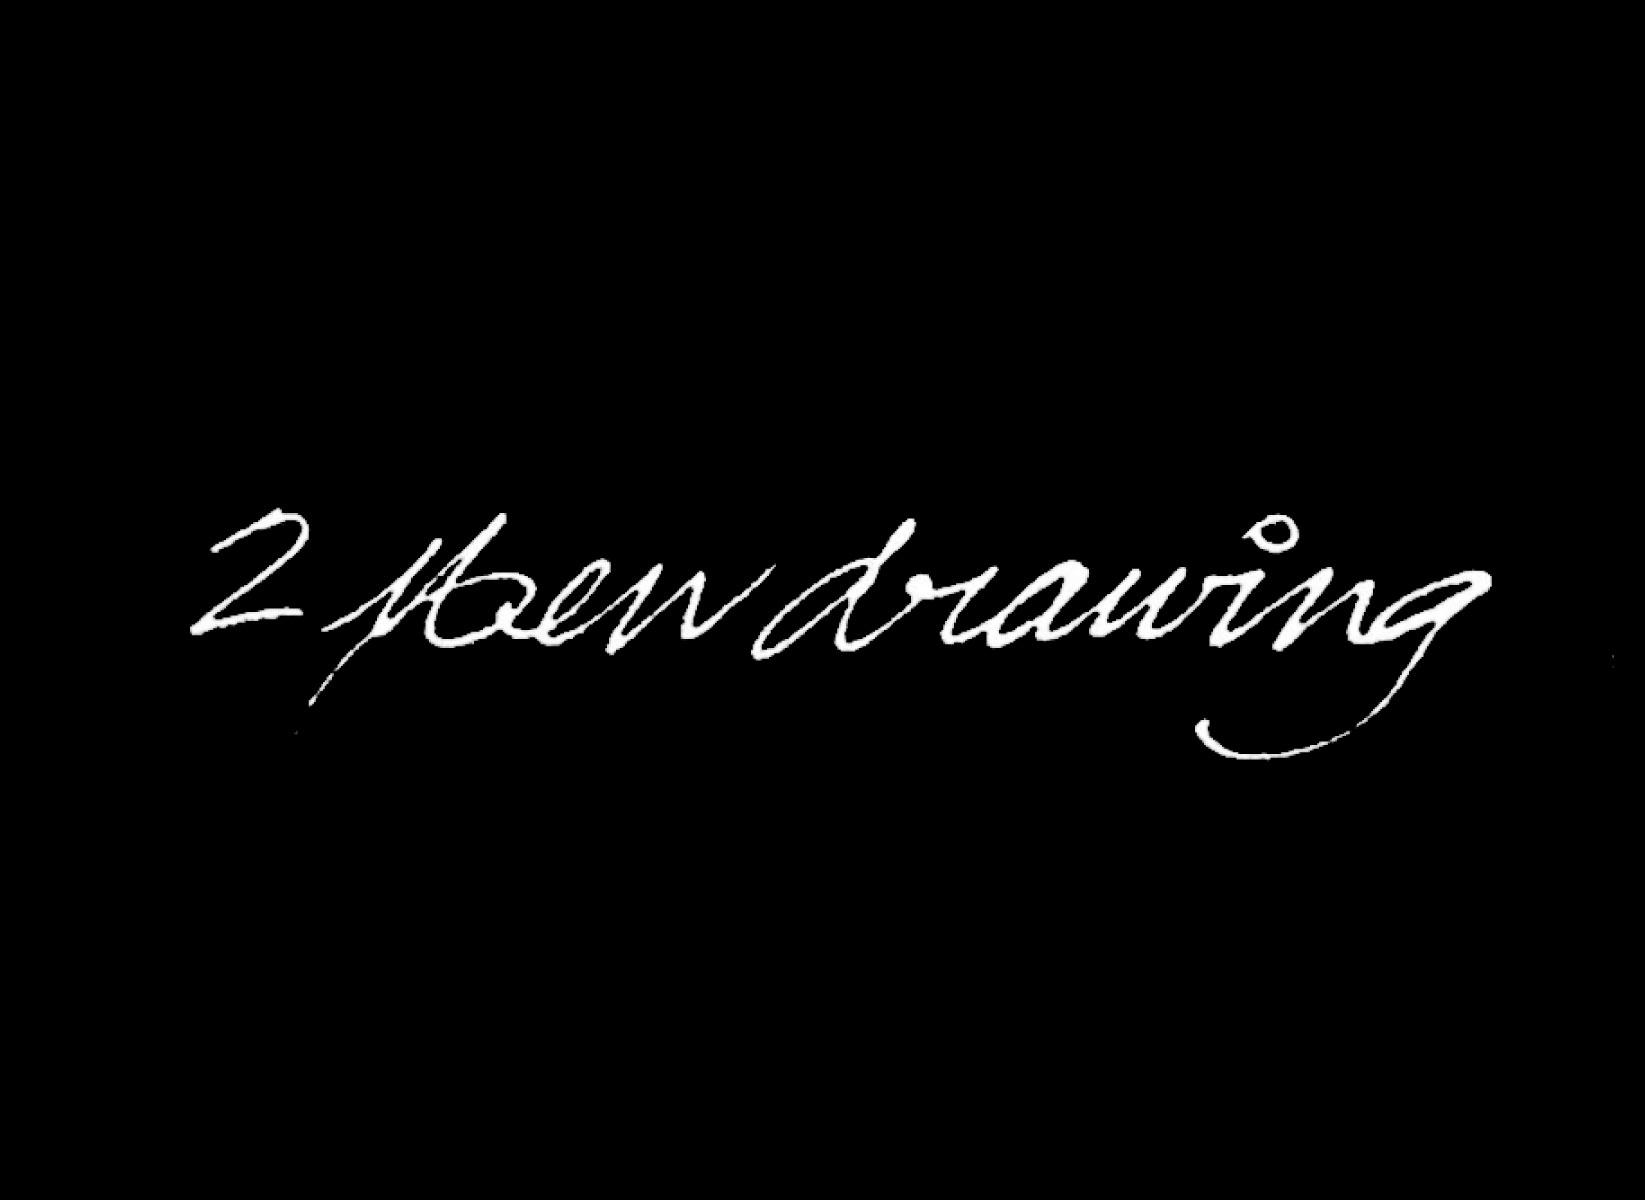 2 men drawing websites logo